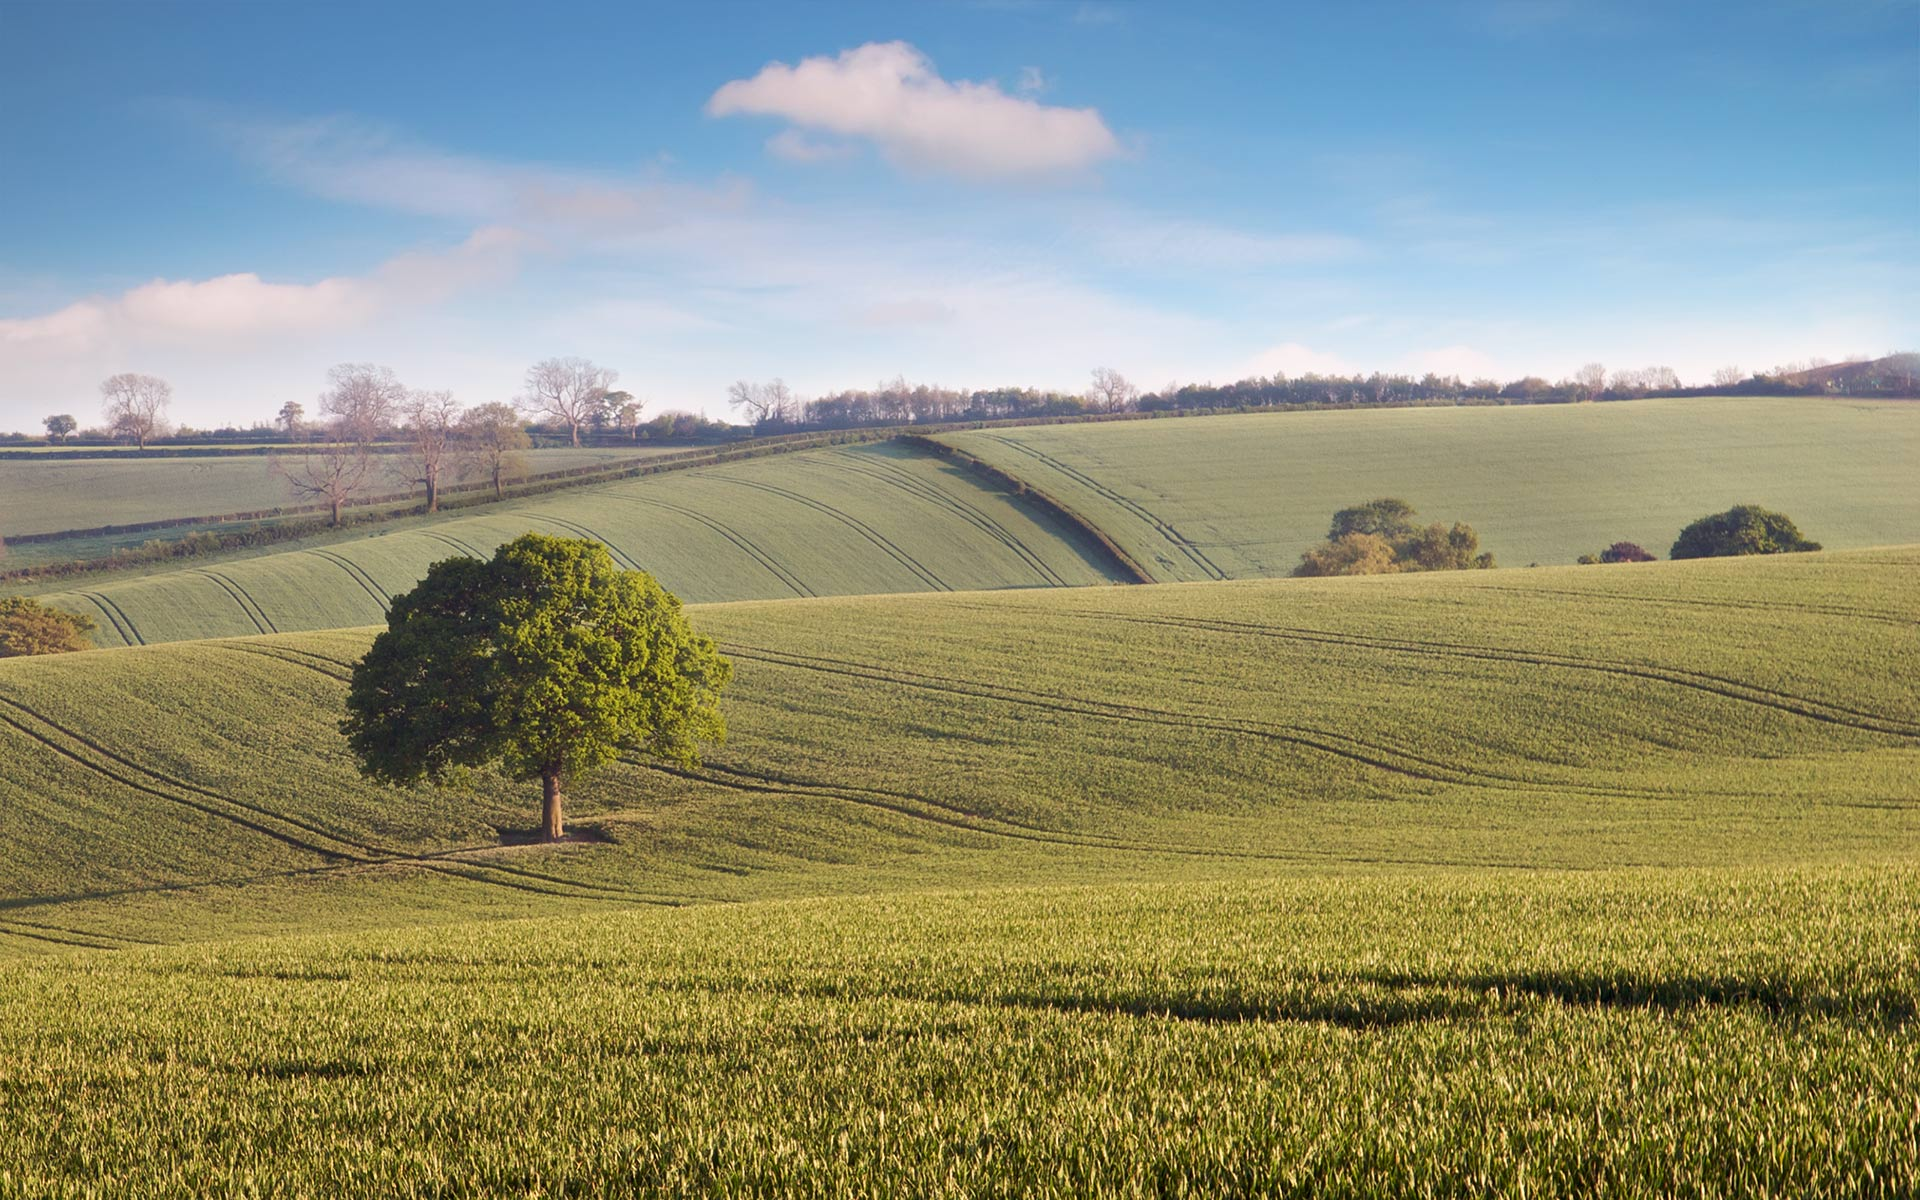 Countryside · Countryside · Countryside · Countryside · Countryside · Countryside Background